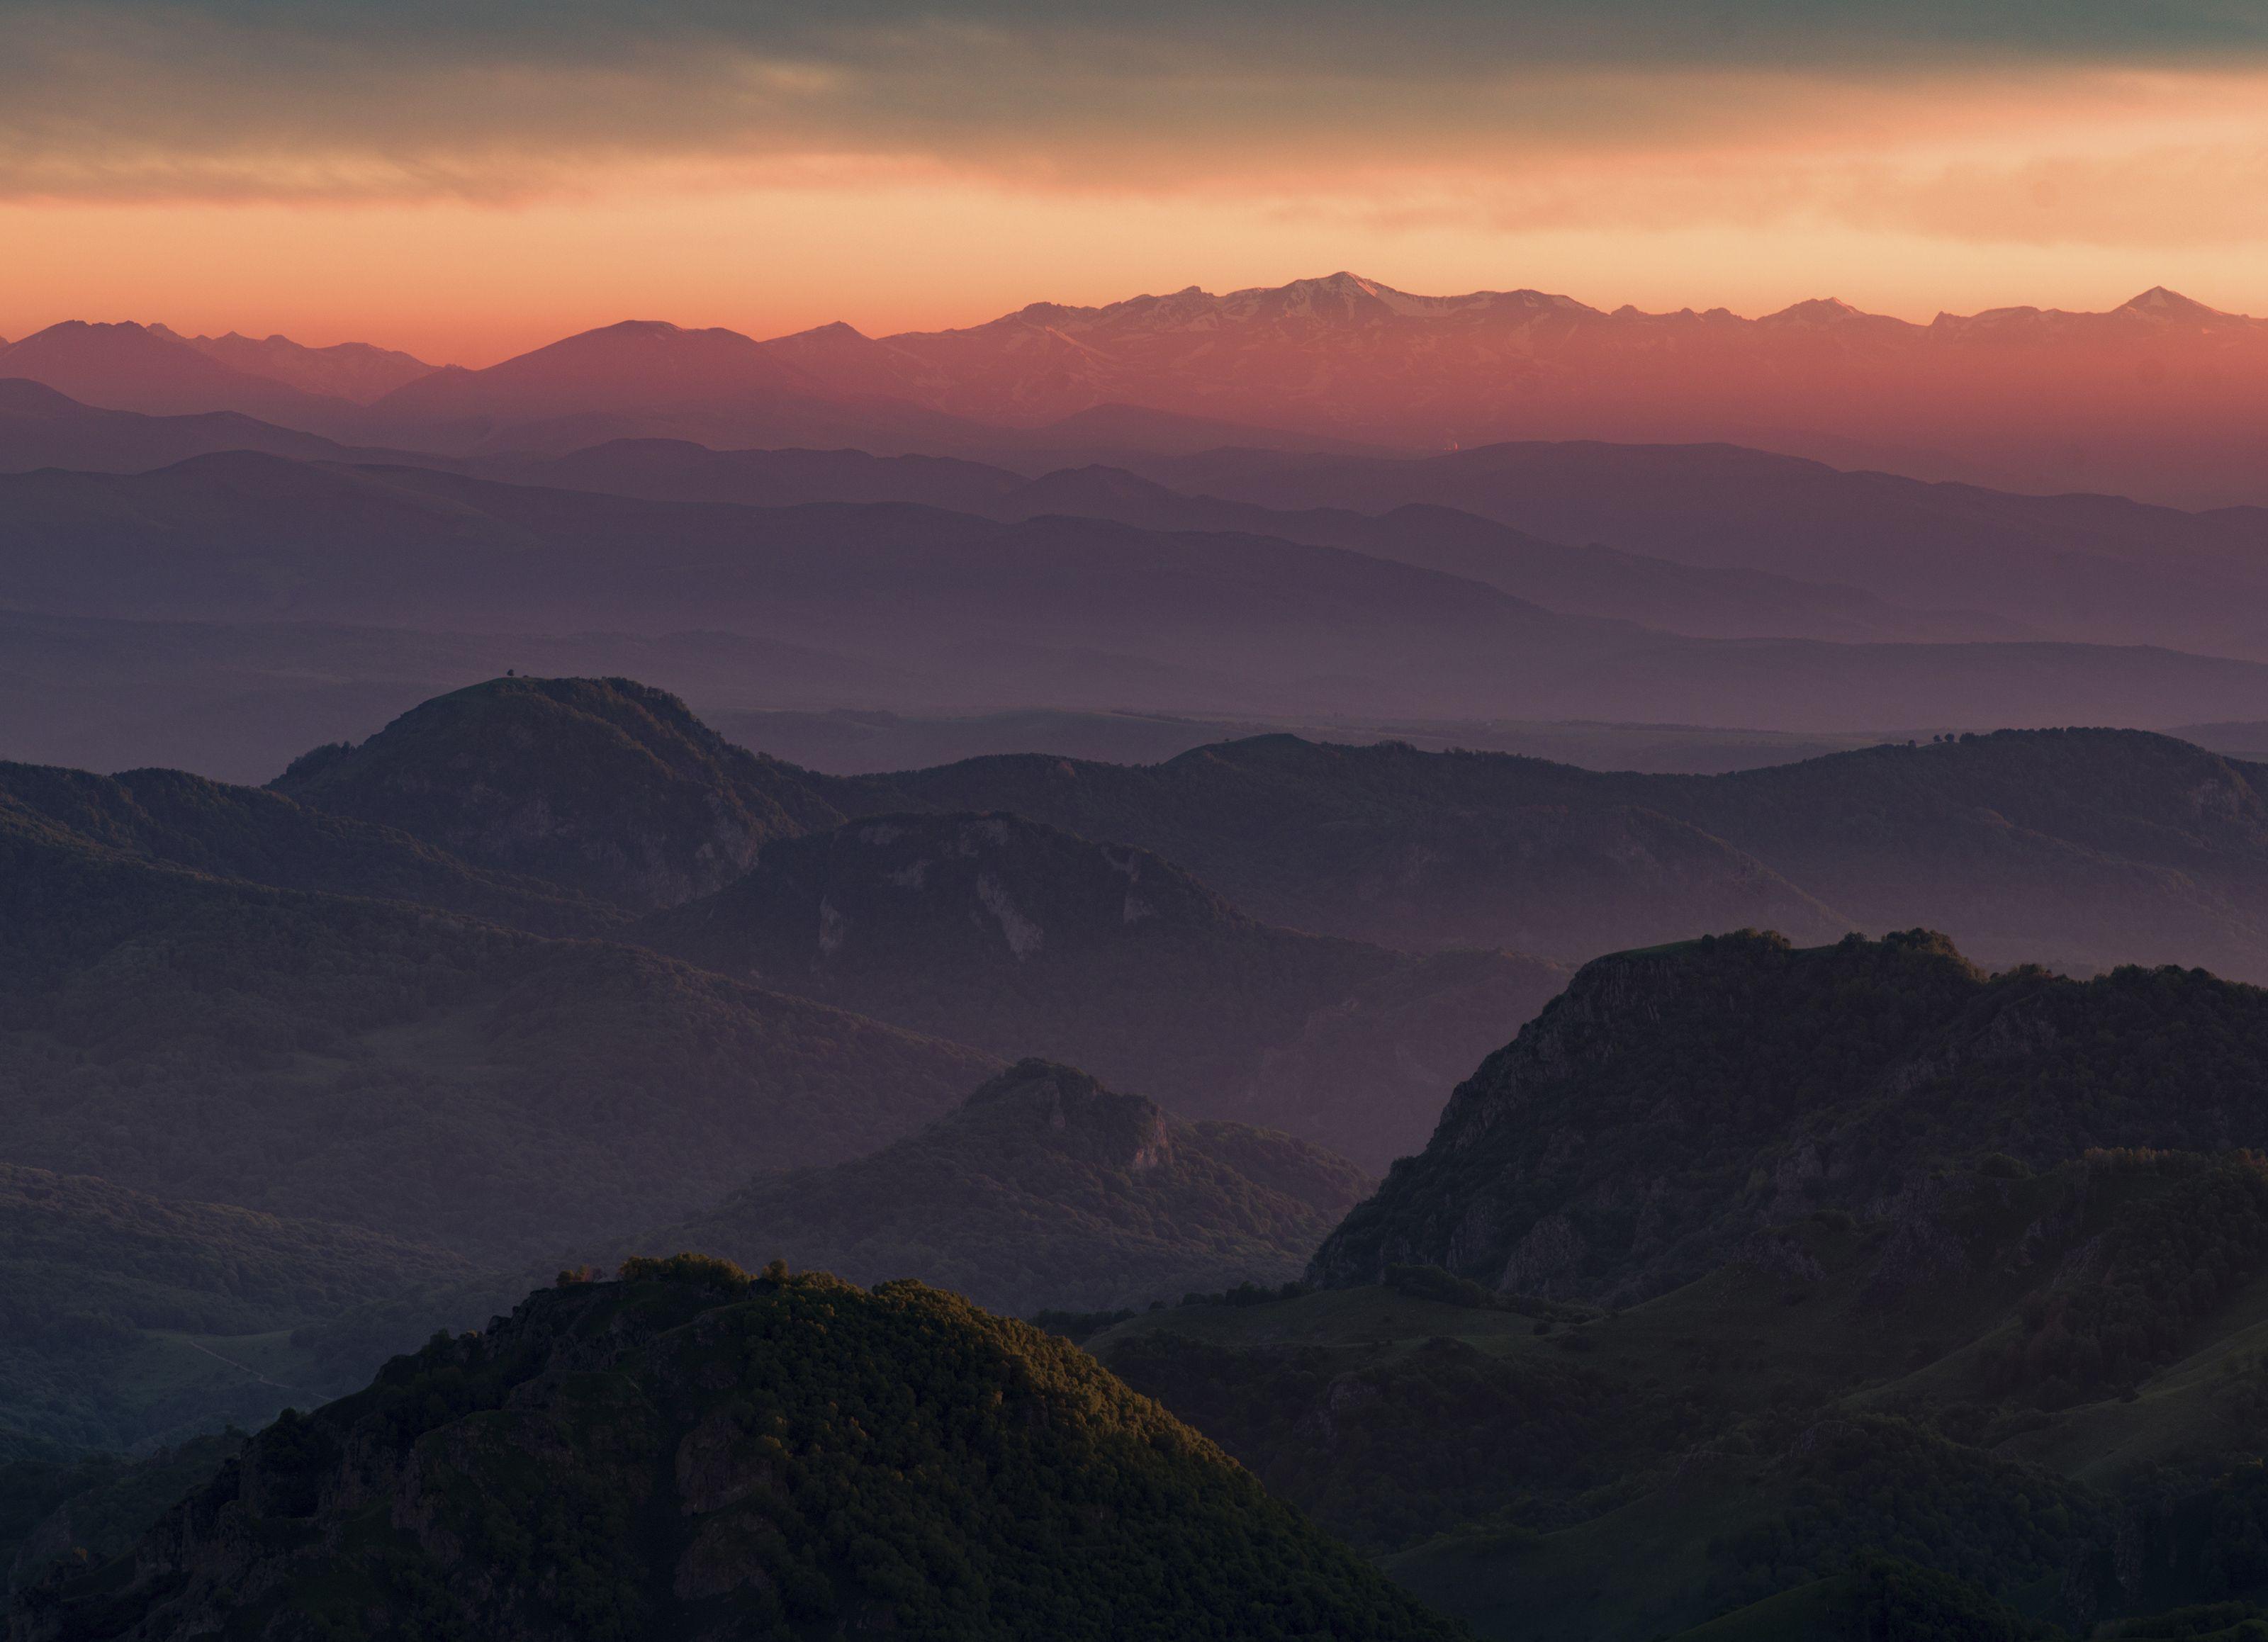 гора, рассвет, небо, плато, облака, утро, закат, вечер , слои, холмы, долина, дымка, туман, Алабердов Арсен